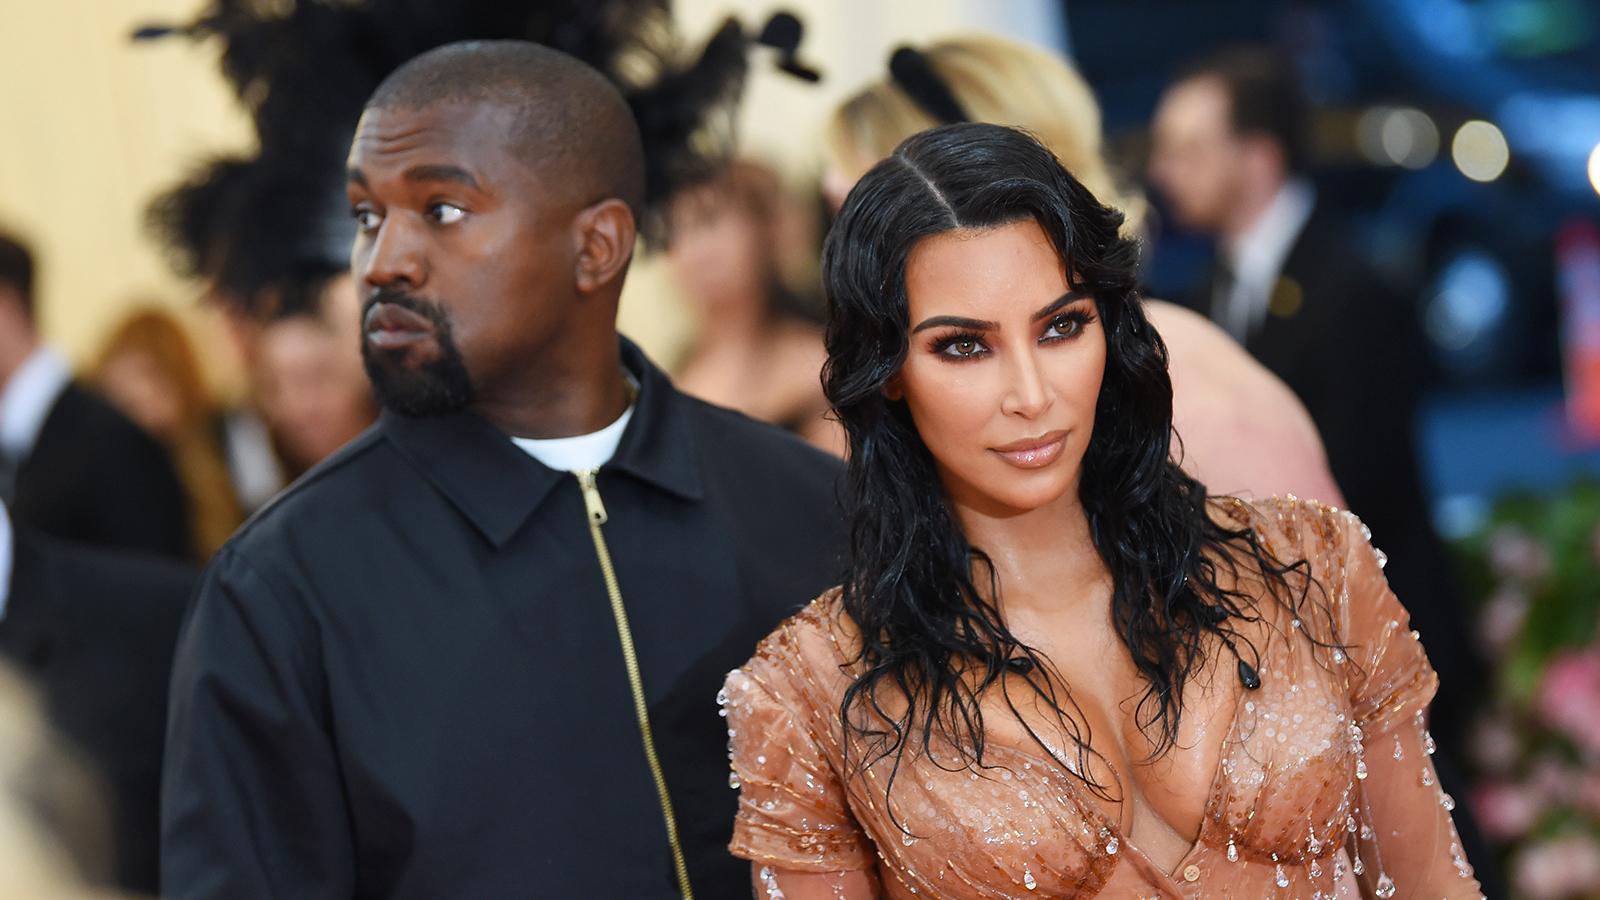 Meet Psalm West: Kim Kardashian Reveals Her Newborn Son's